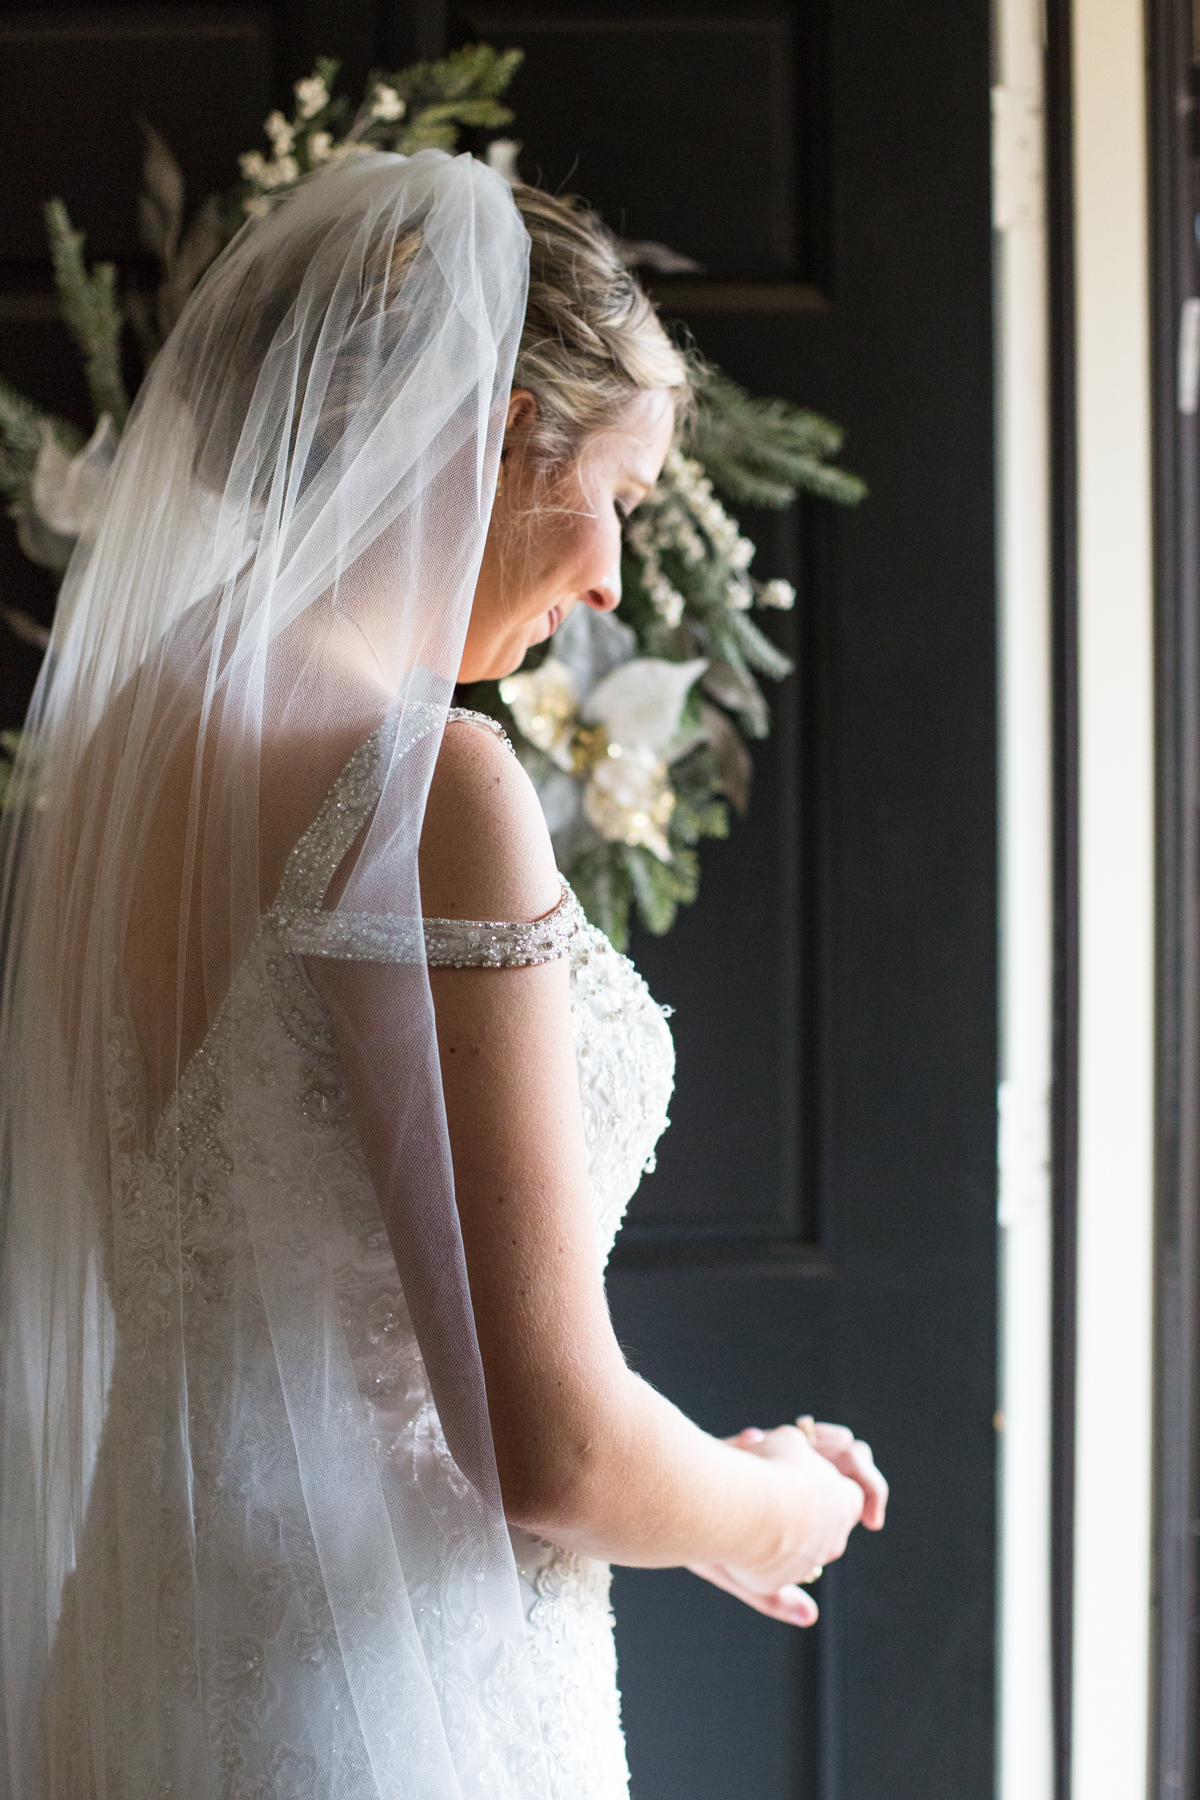 Kelli-and-Matt-Nashville-Wedding-Sneak-Peak-0076.jpg